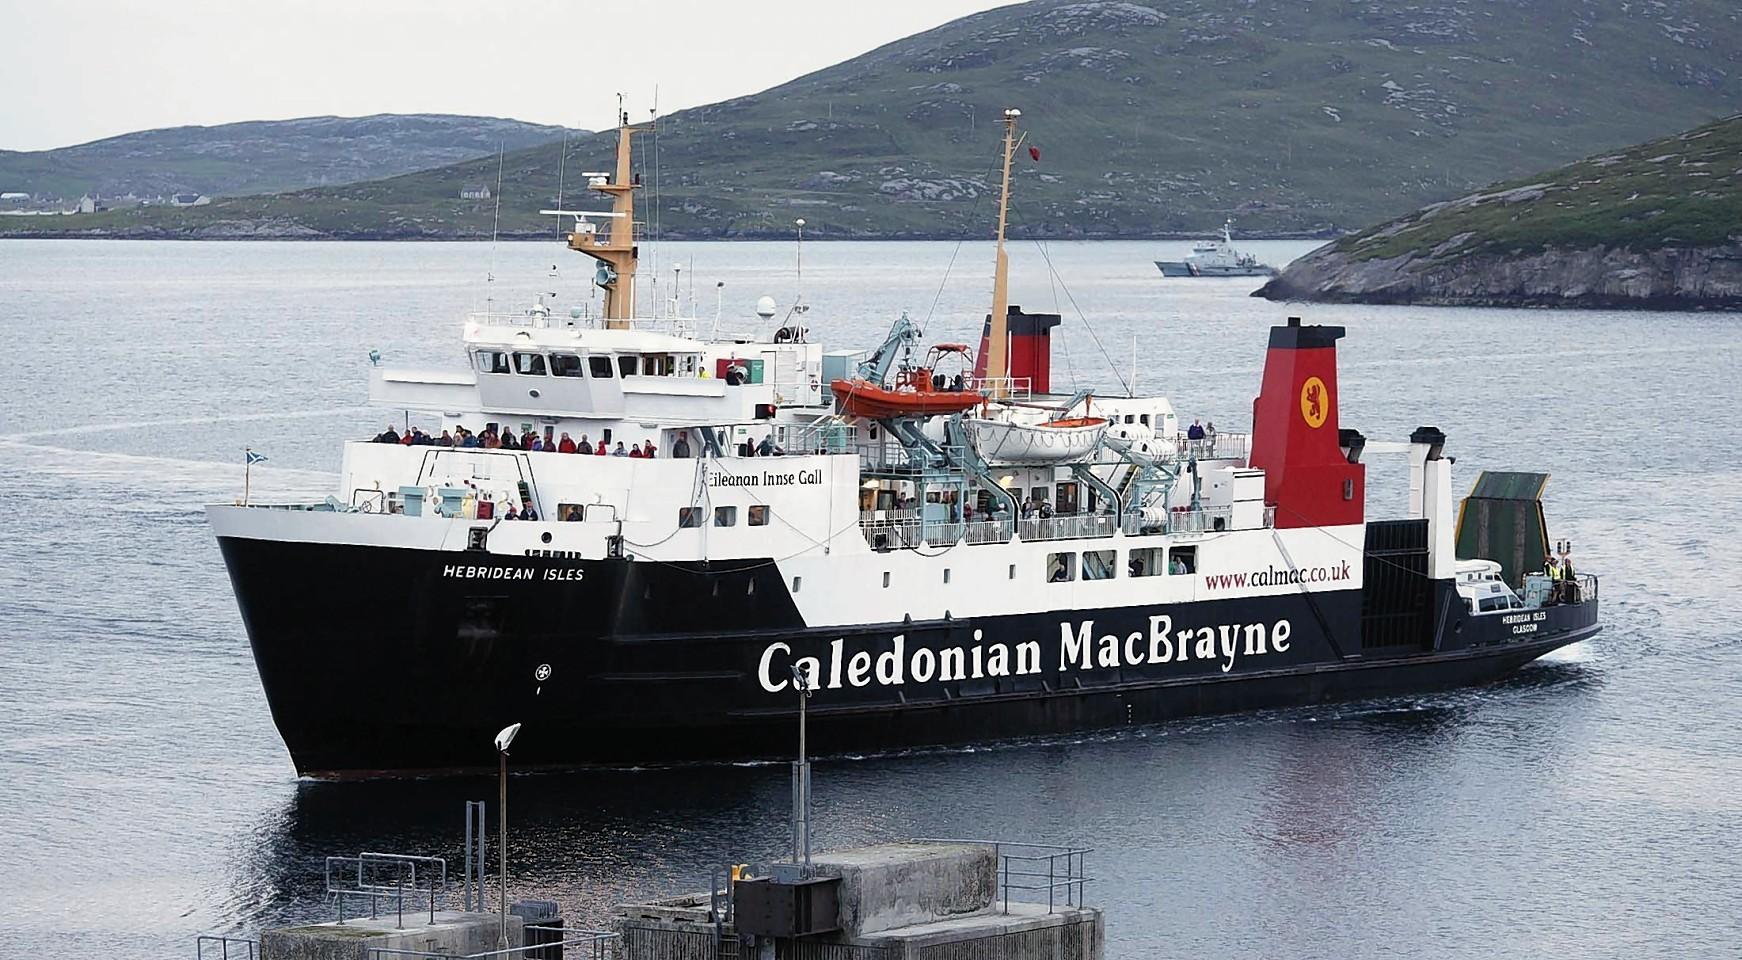 The CalMac ferry MV Hebridean Isles arriving at Castlebay on the Island of Barra.